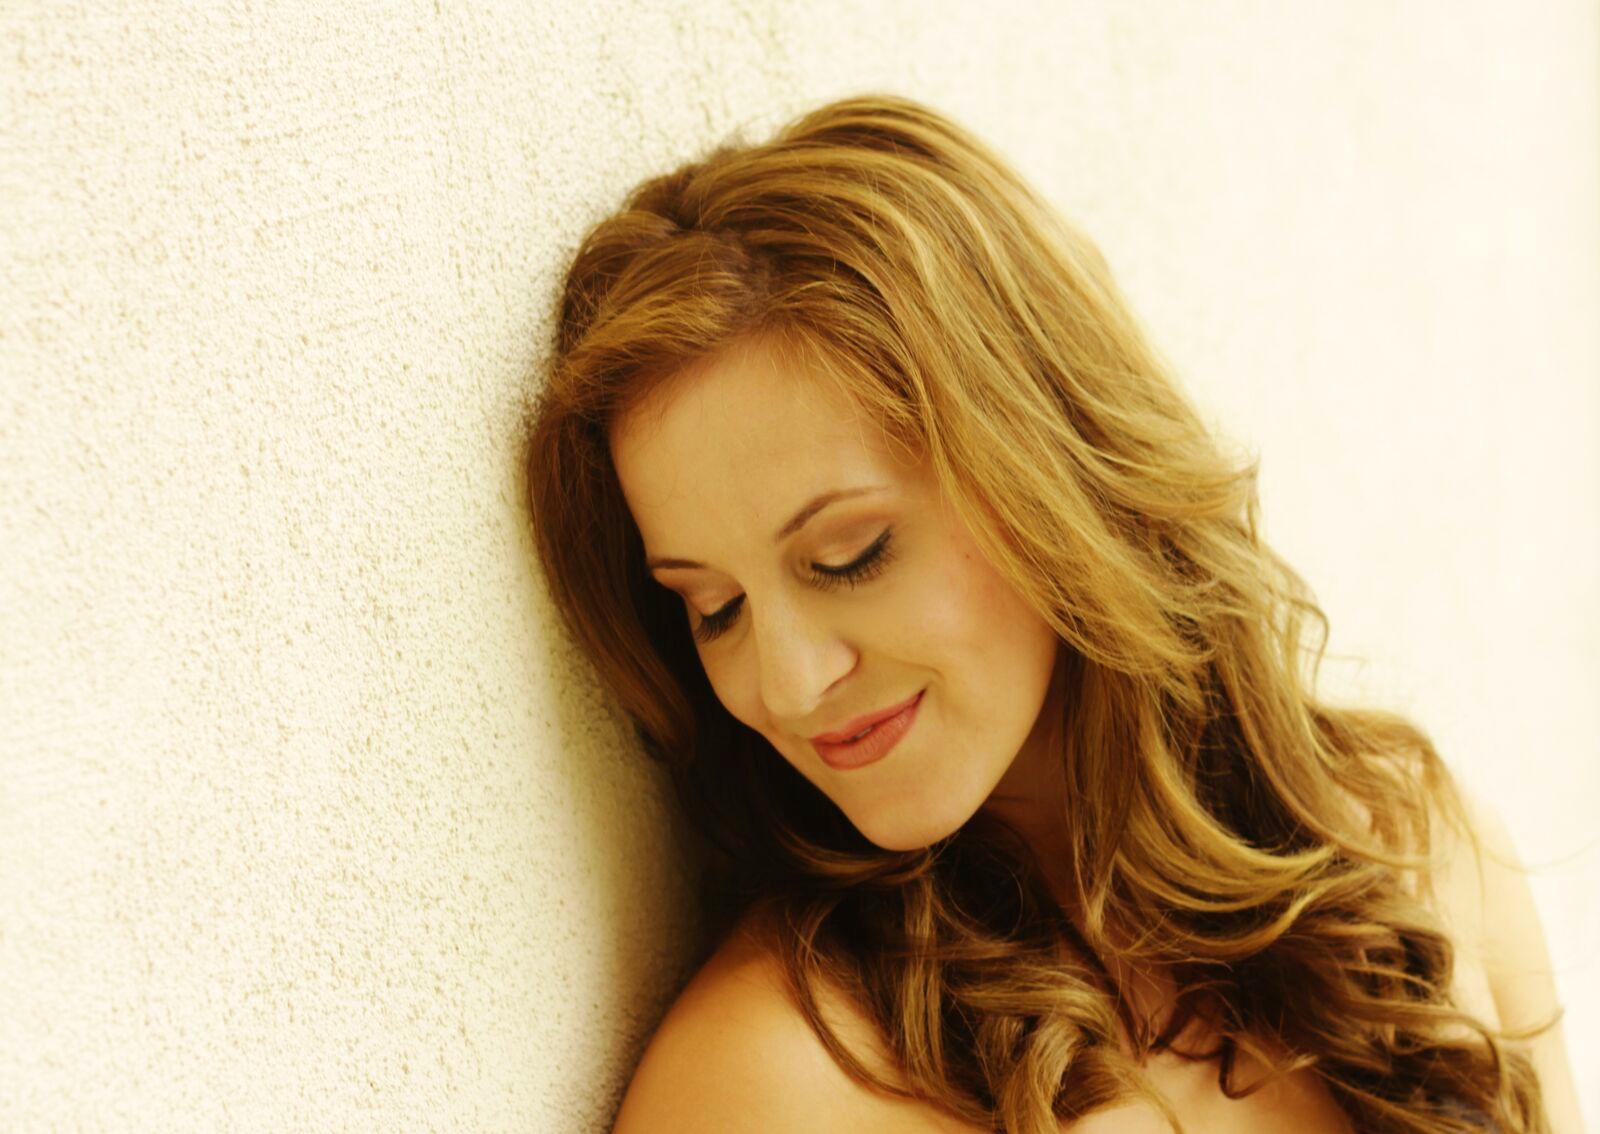 Kimberly Spencer - On Wall.jpg